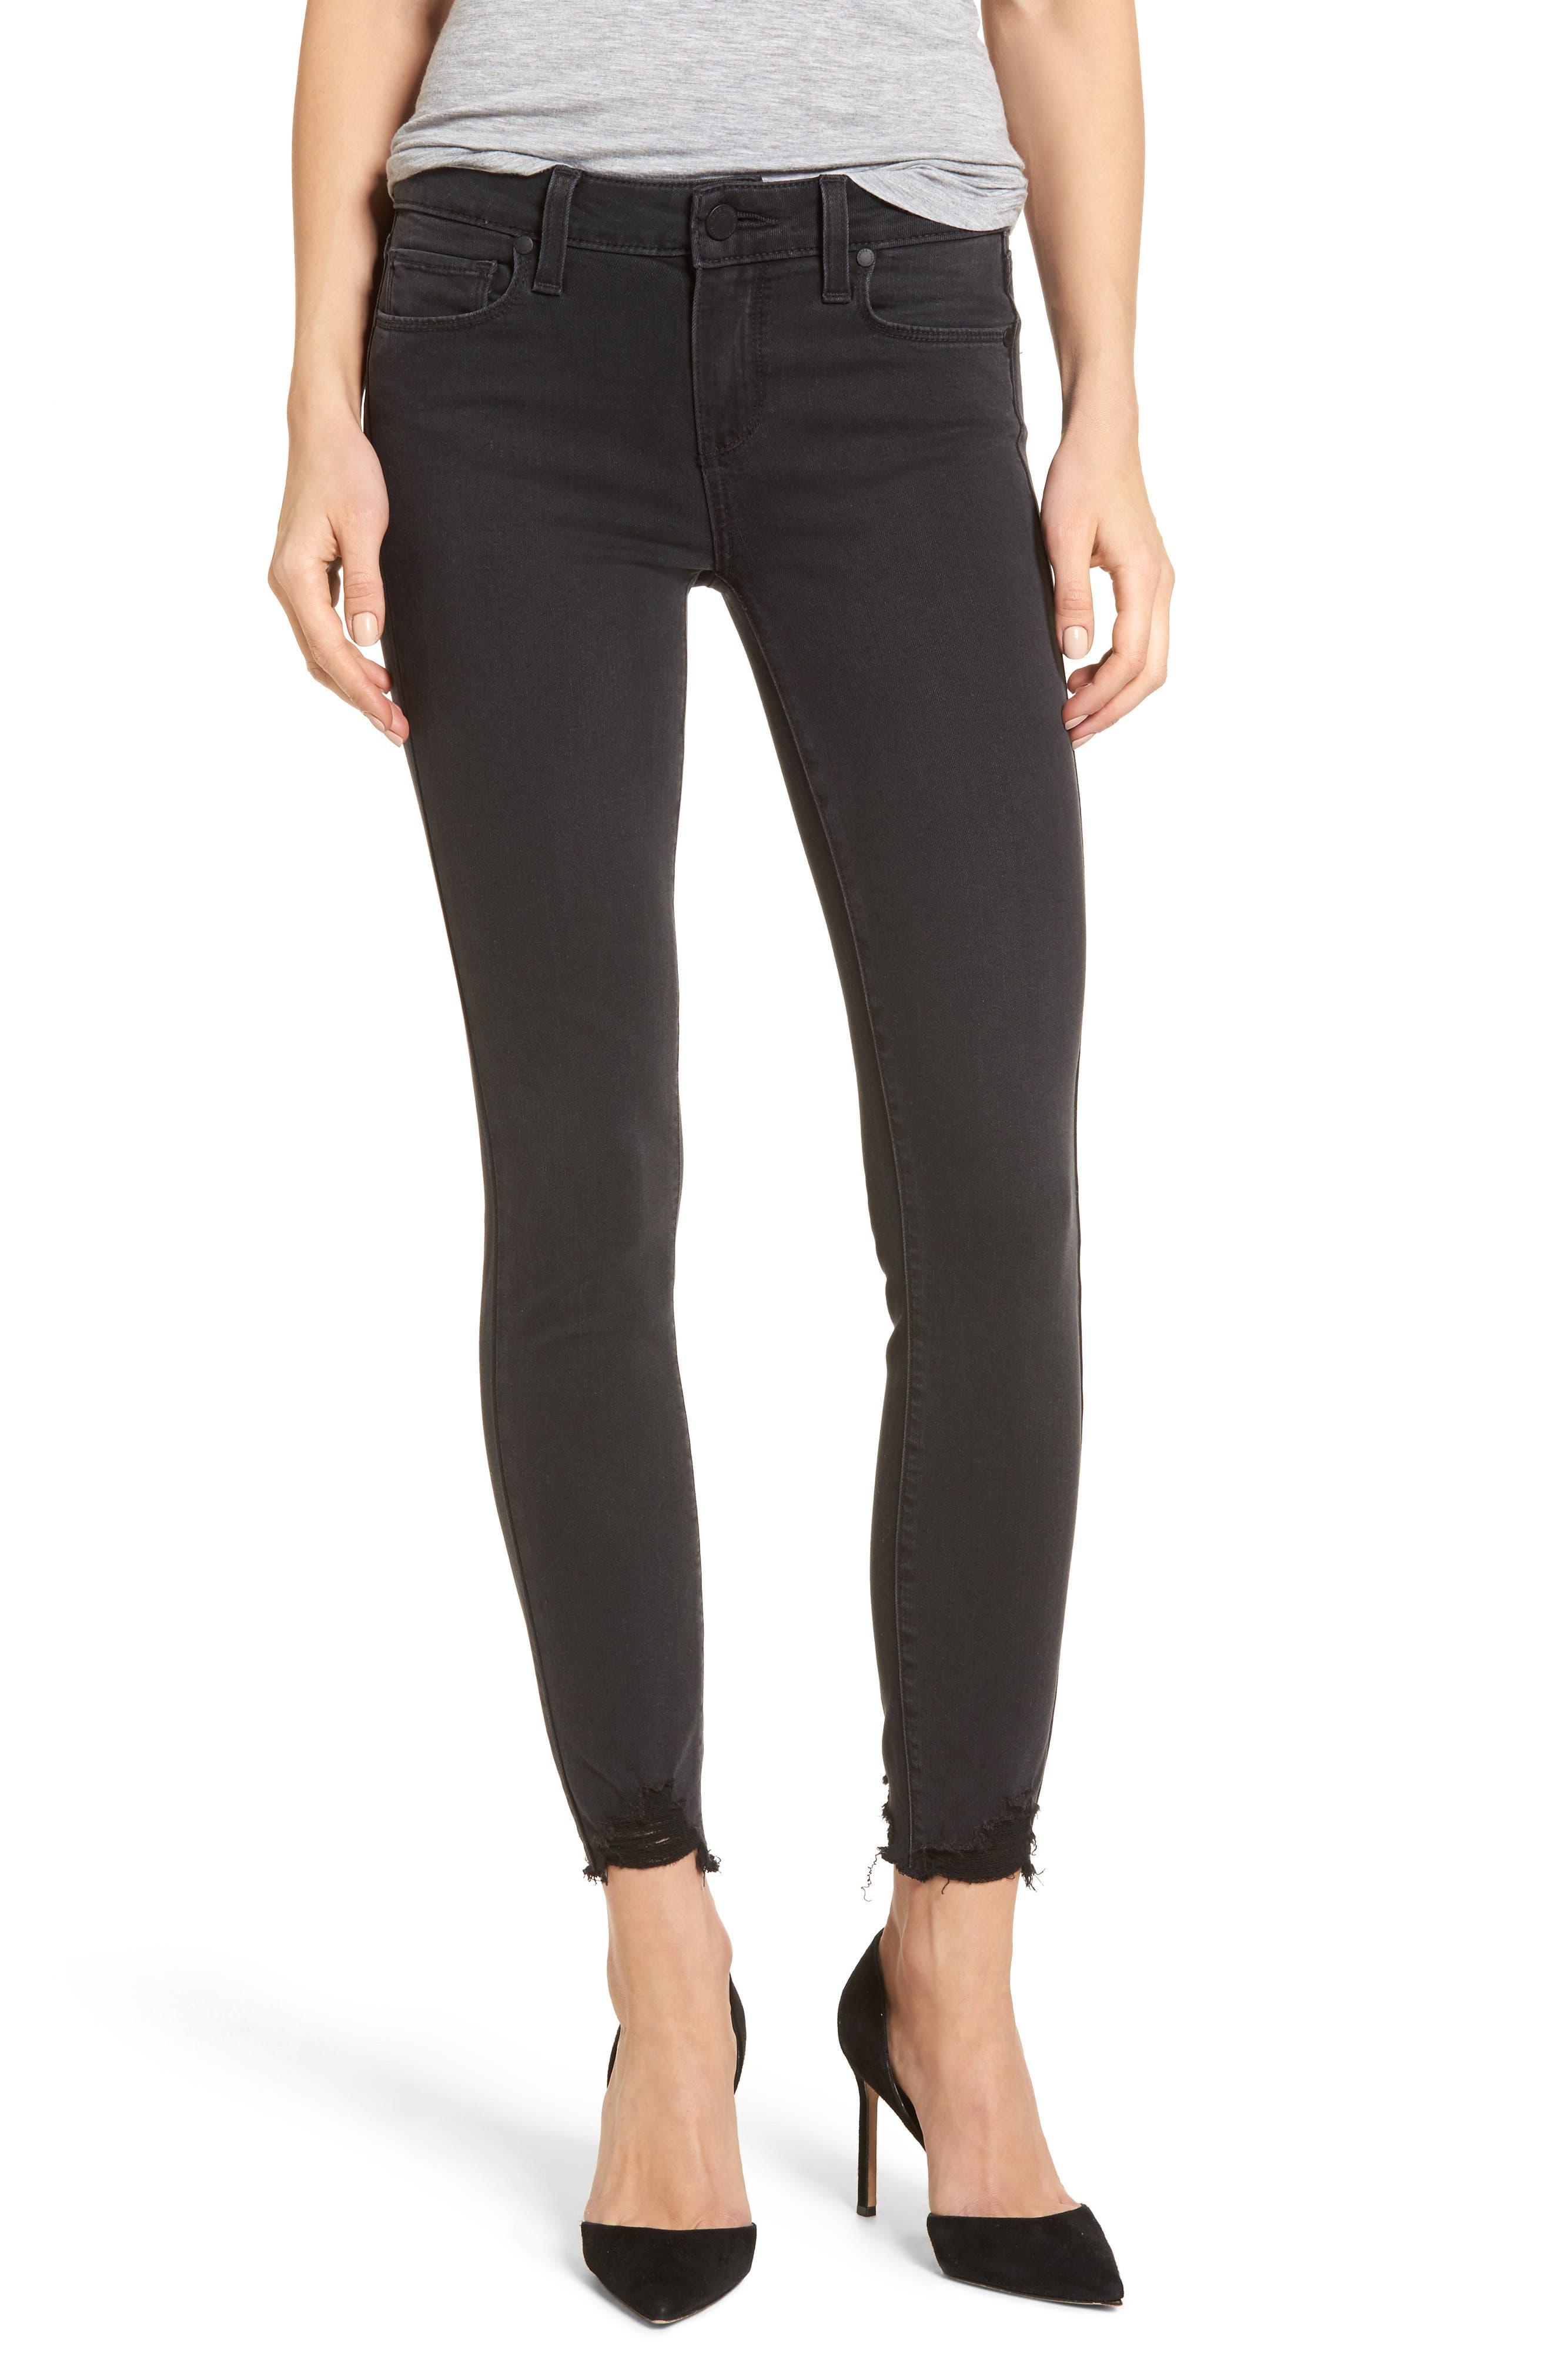 Transcend - Verdugo Ankle Skinny Jeans,                             Main thumbnail 1, color,                             Black Fog Super Distressed